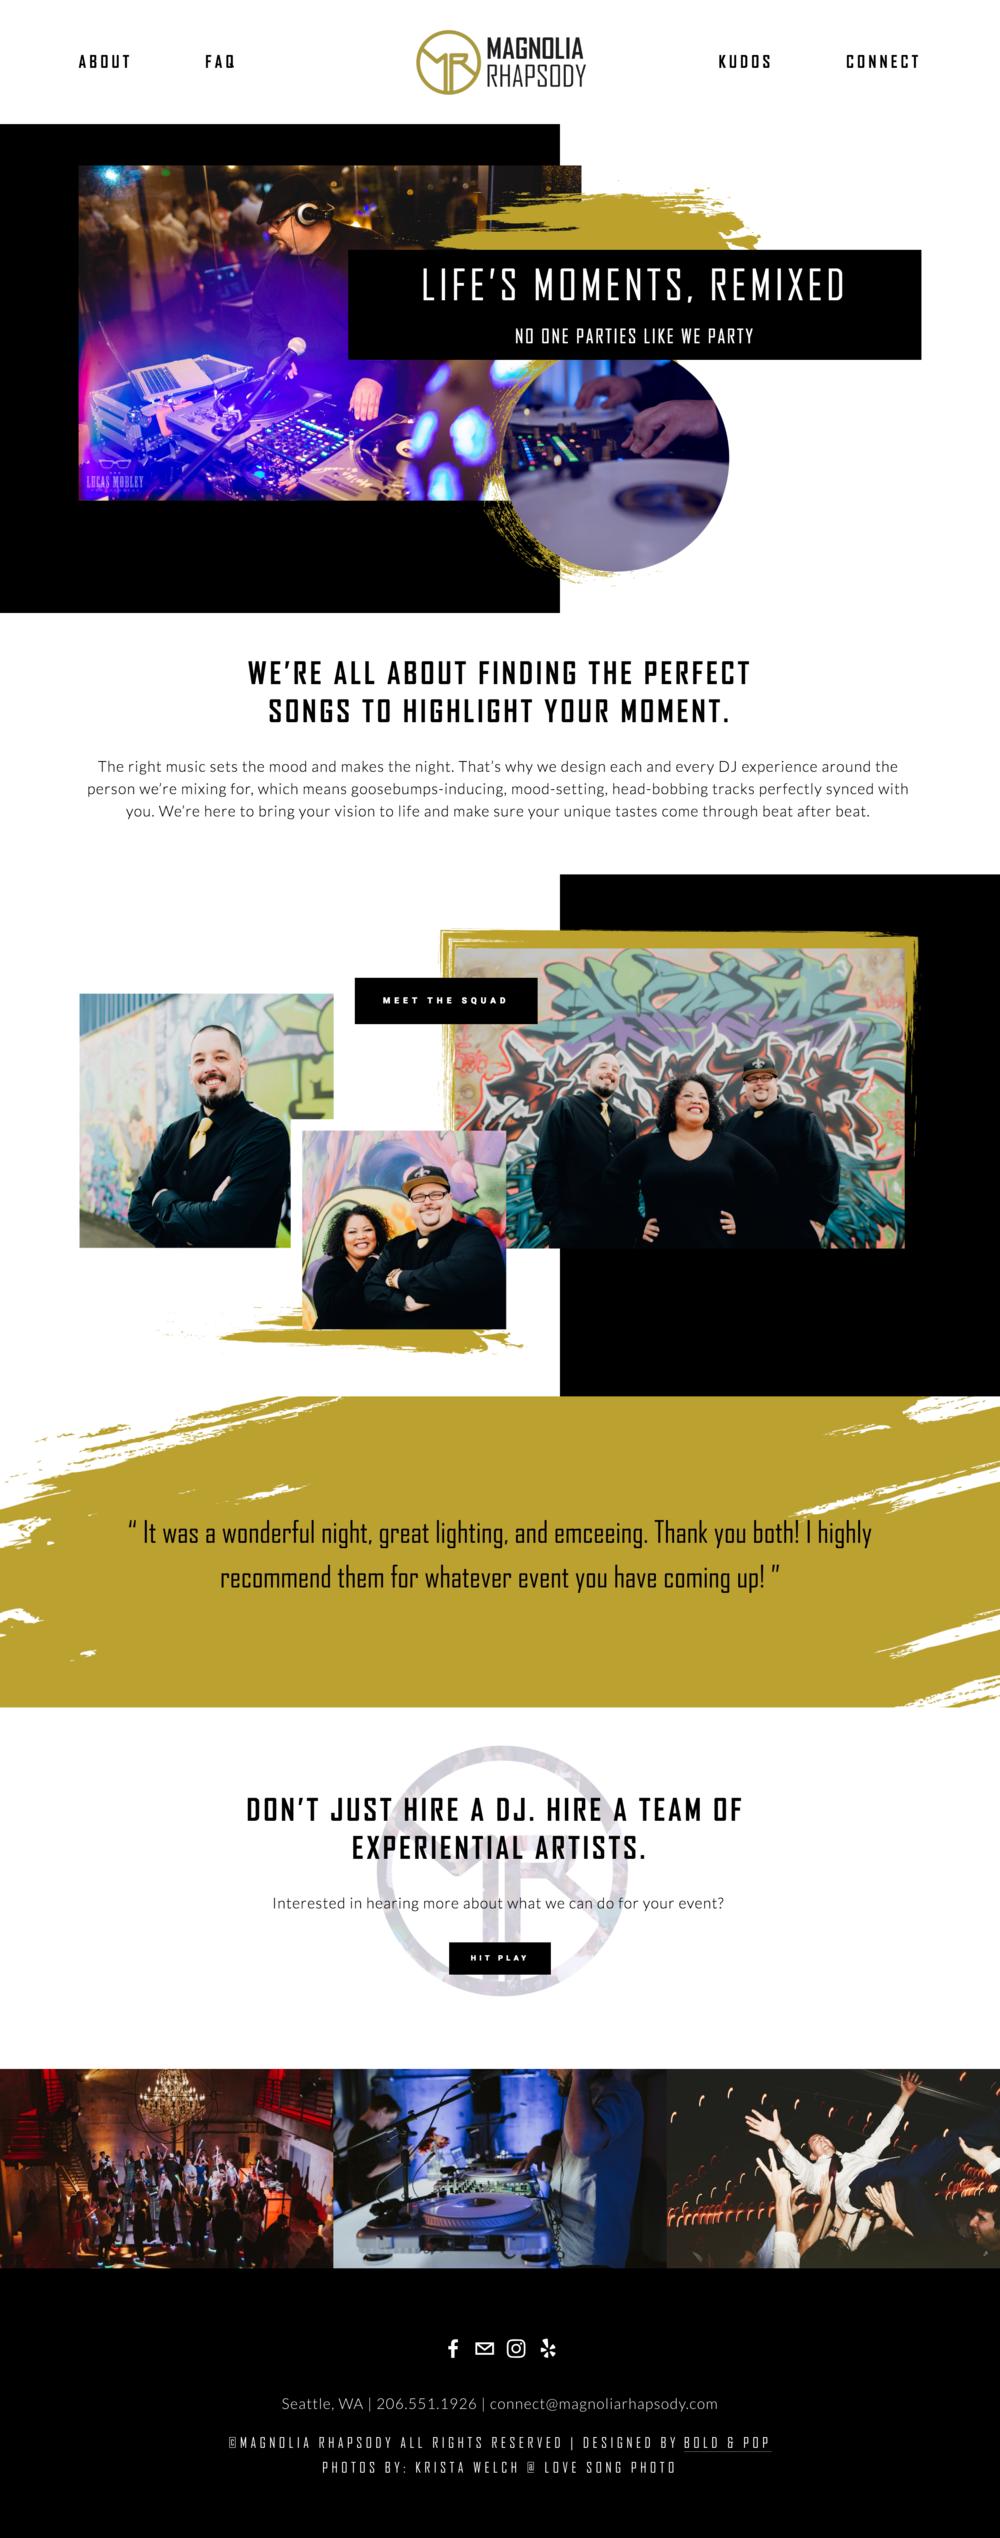 Event & Wedding DJ Services Website Design